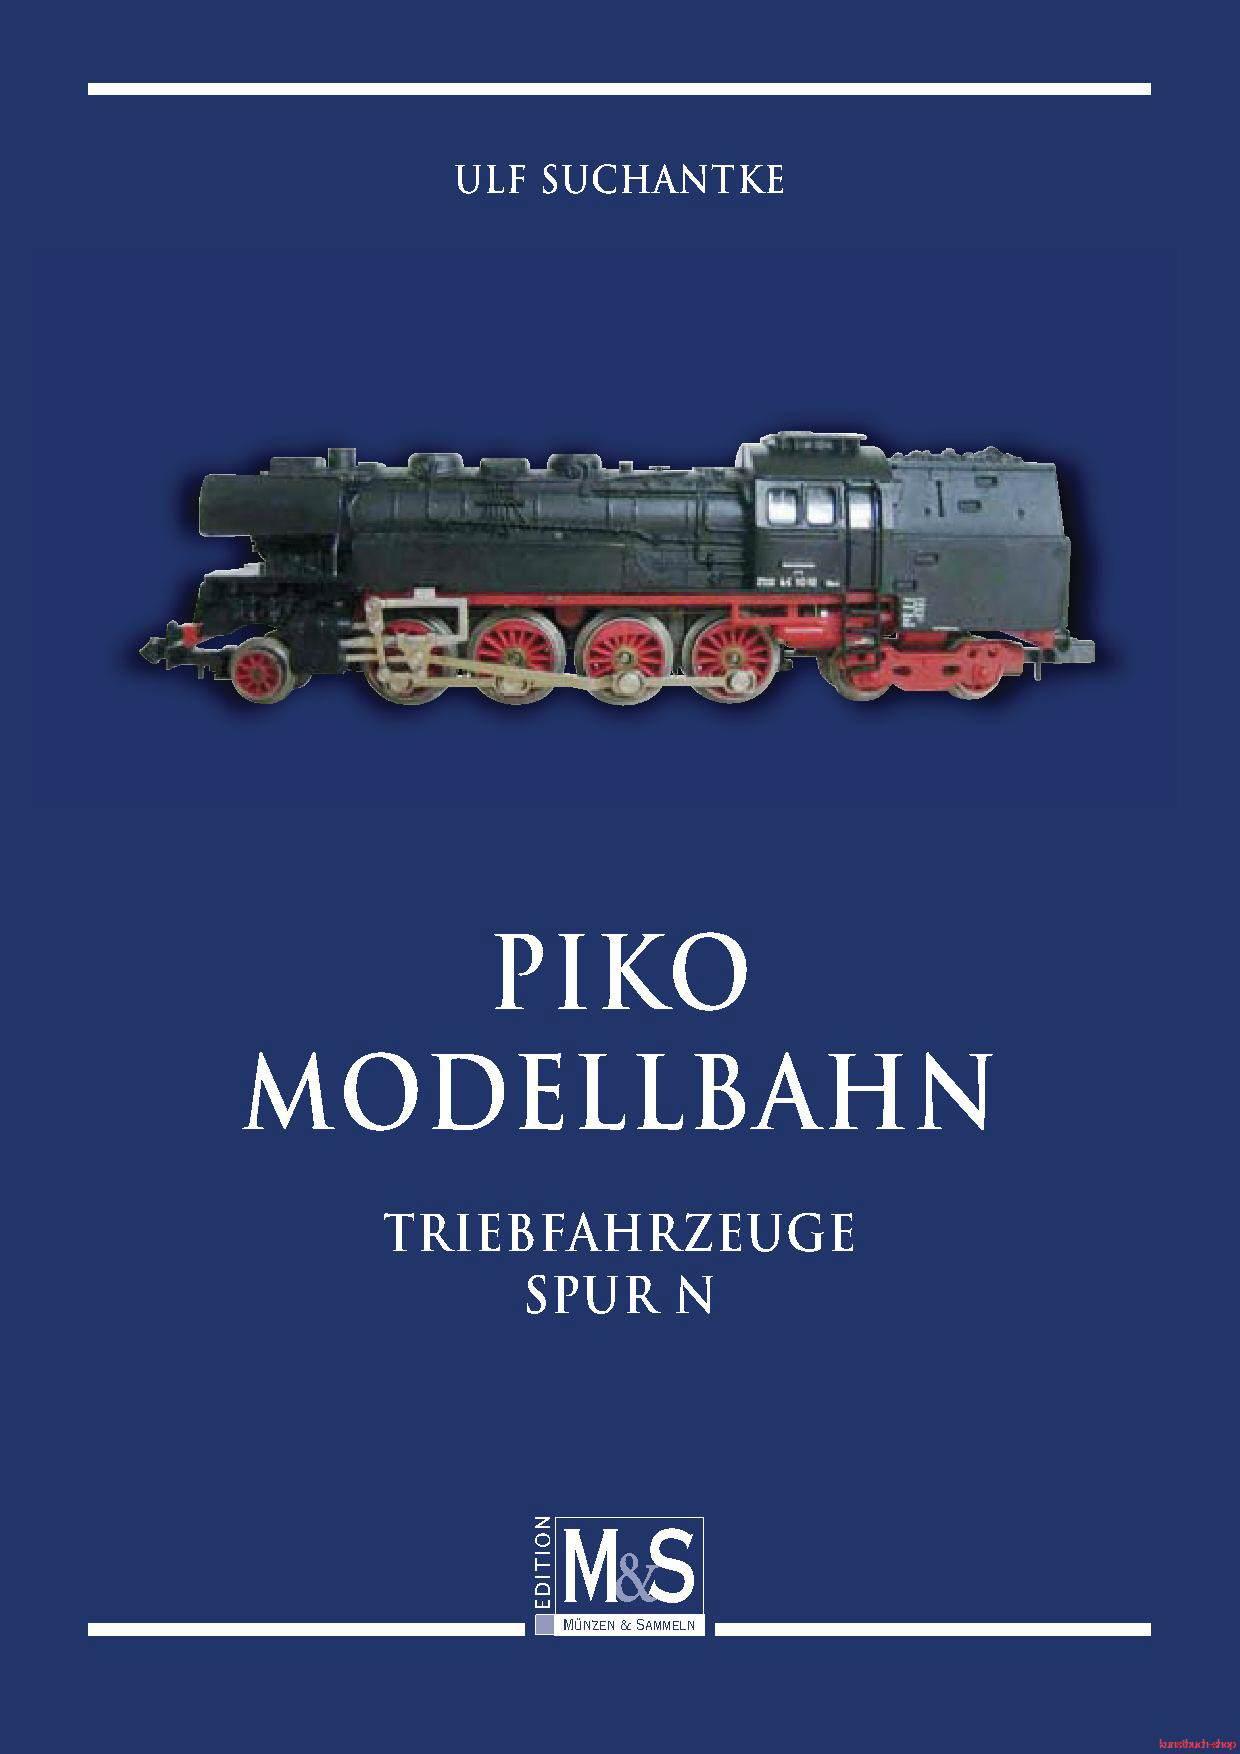 PIKO Modellbahn  Triebfahrzeuge Spur N - Ulf Suchantke